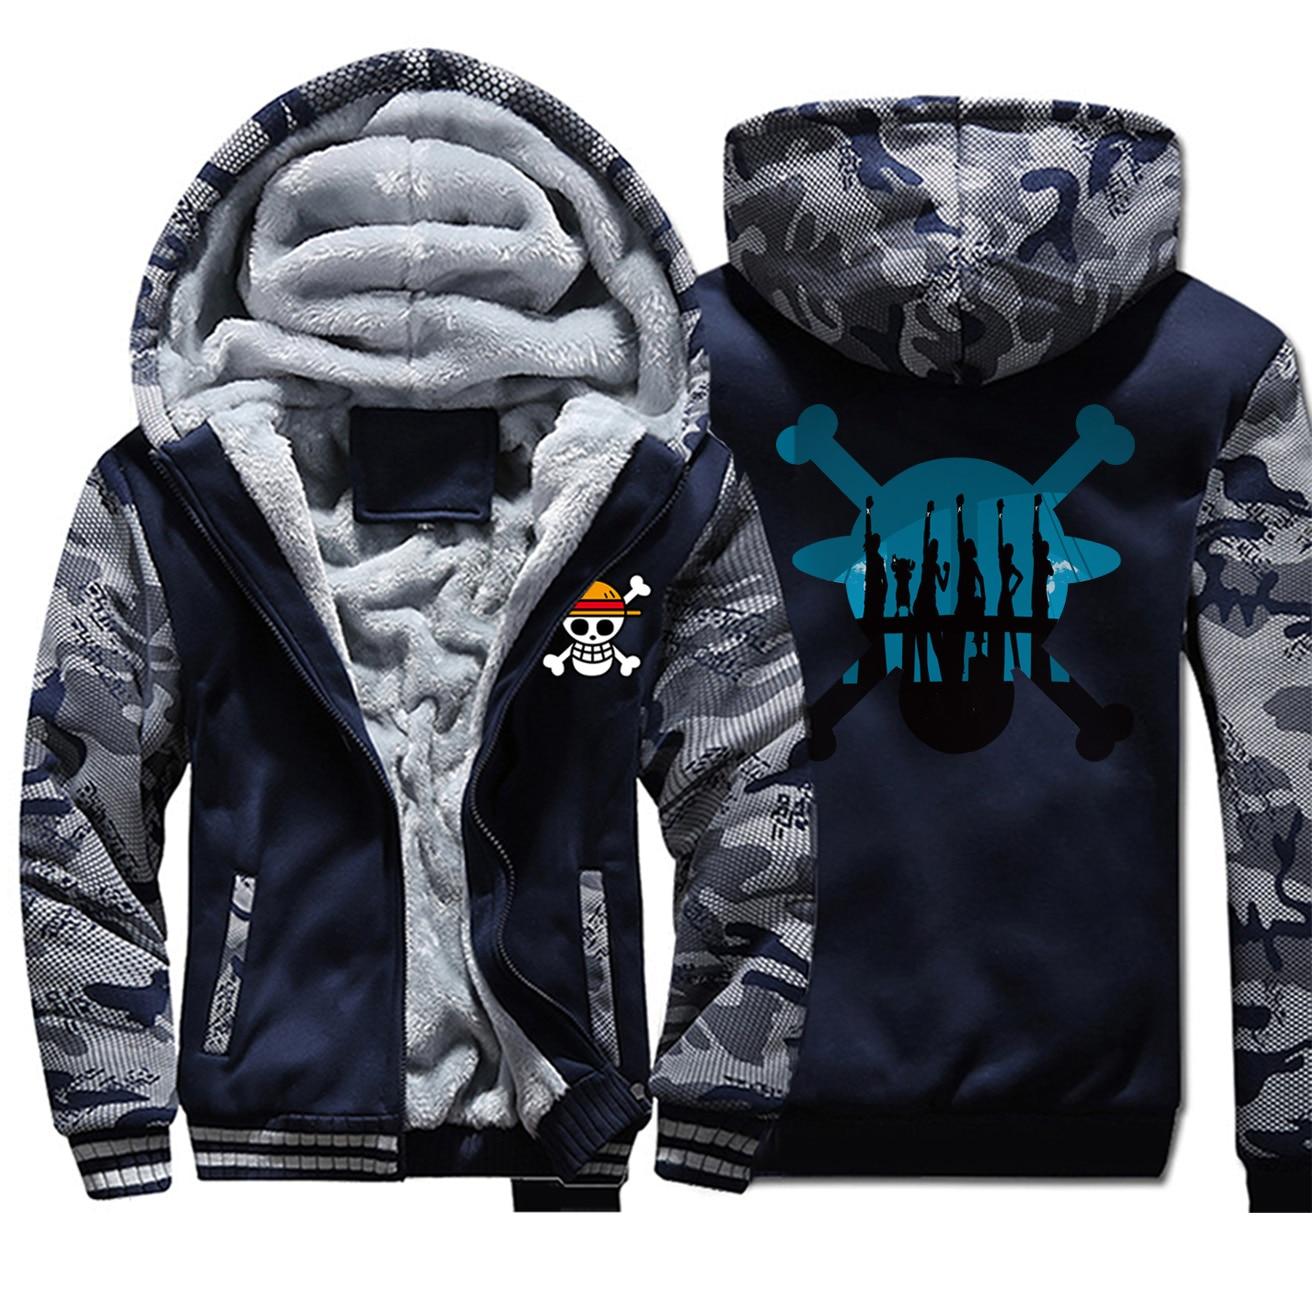 2019 New Winter Luffy Coat Thick Hoodies Japan Anime One Piece Sweatshirts Men Funny Camouflage Warm Clothing Raglan Streetwear